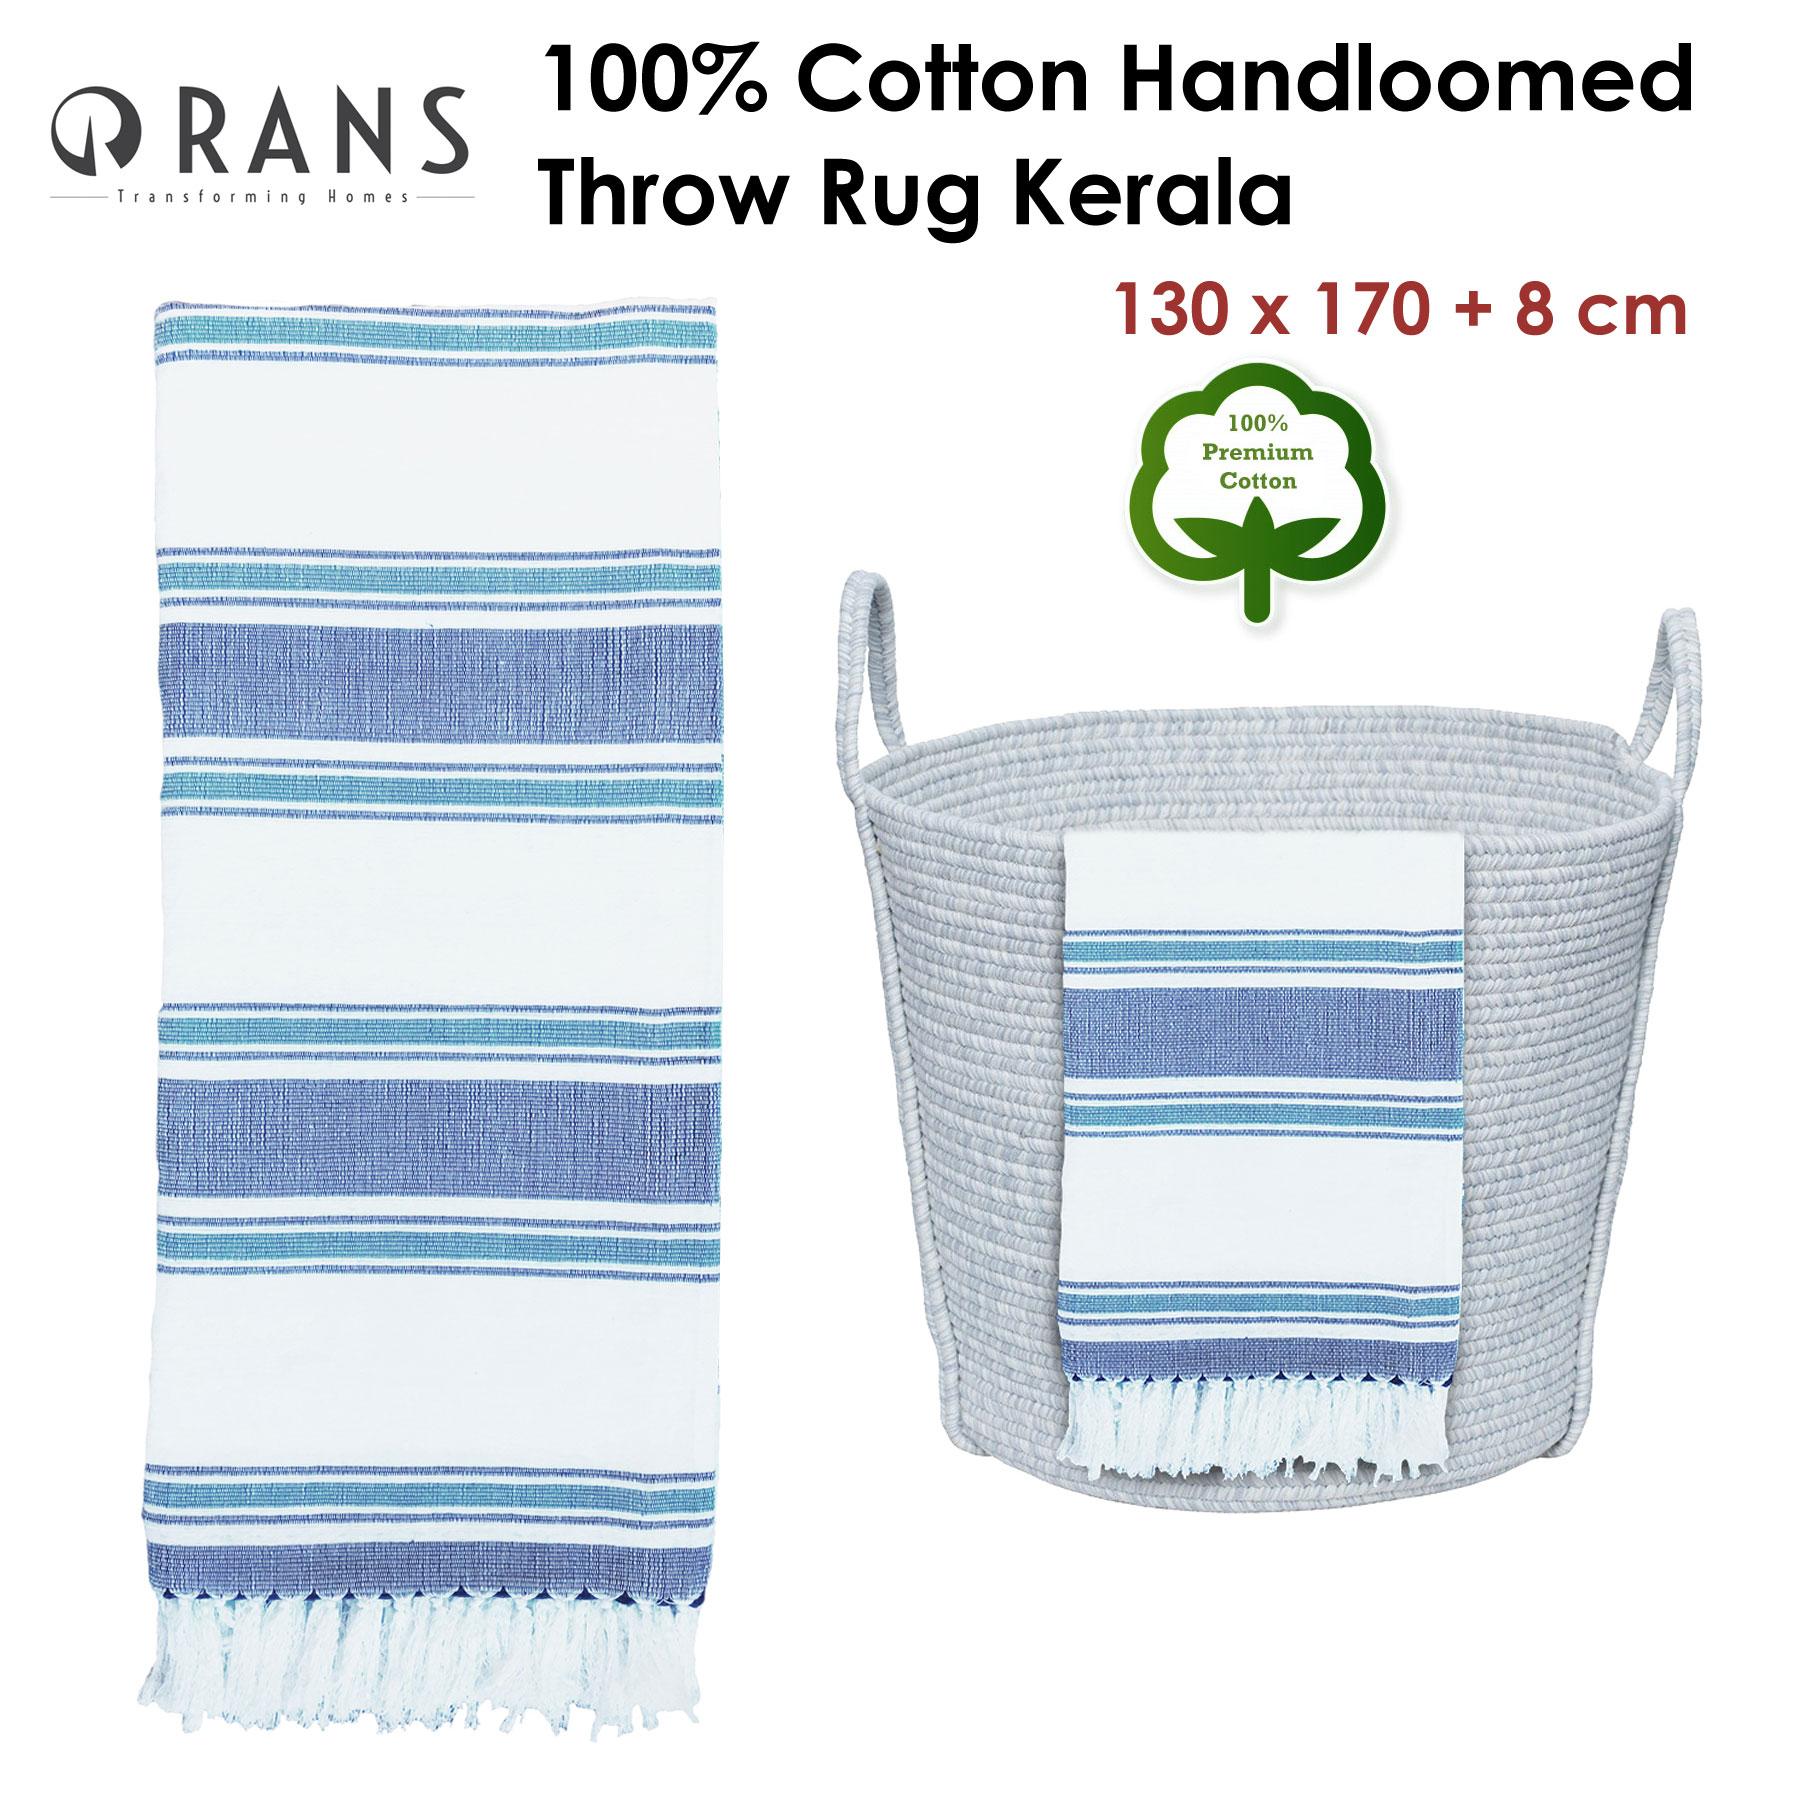 8 cm by Rans Premium 100/% Cotton Handloomed Throw Rug Kerala 130 x 170